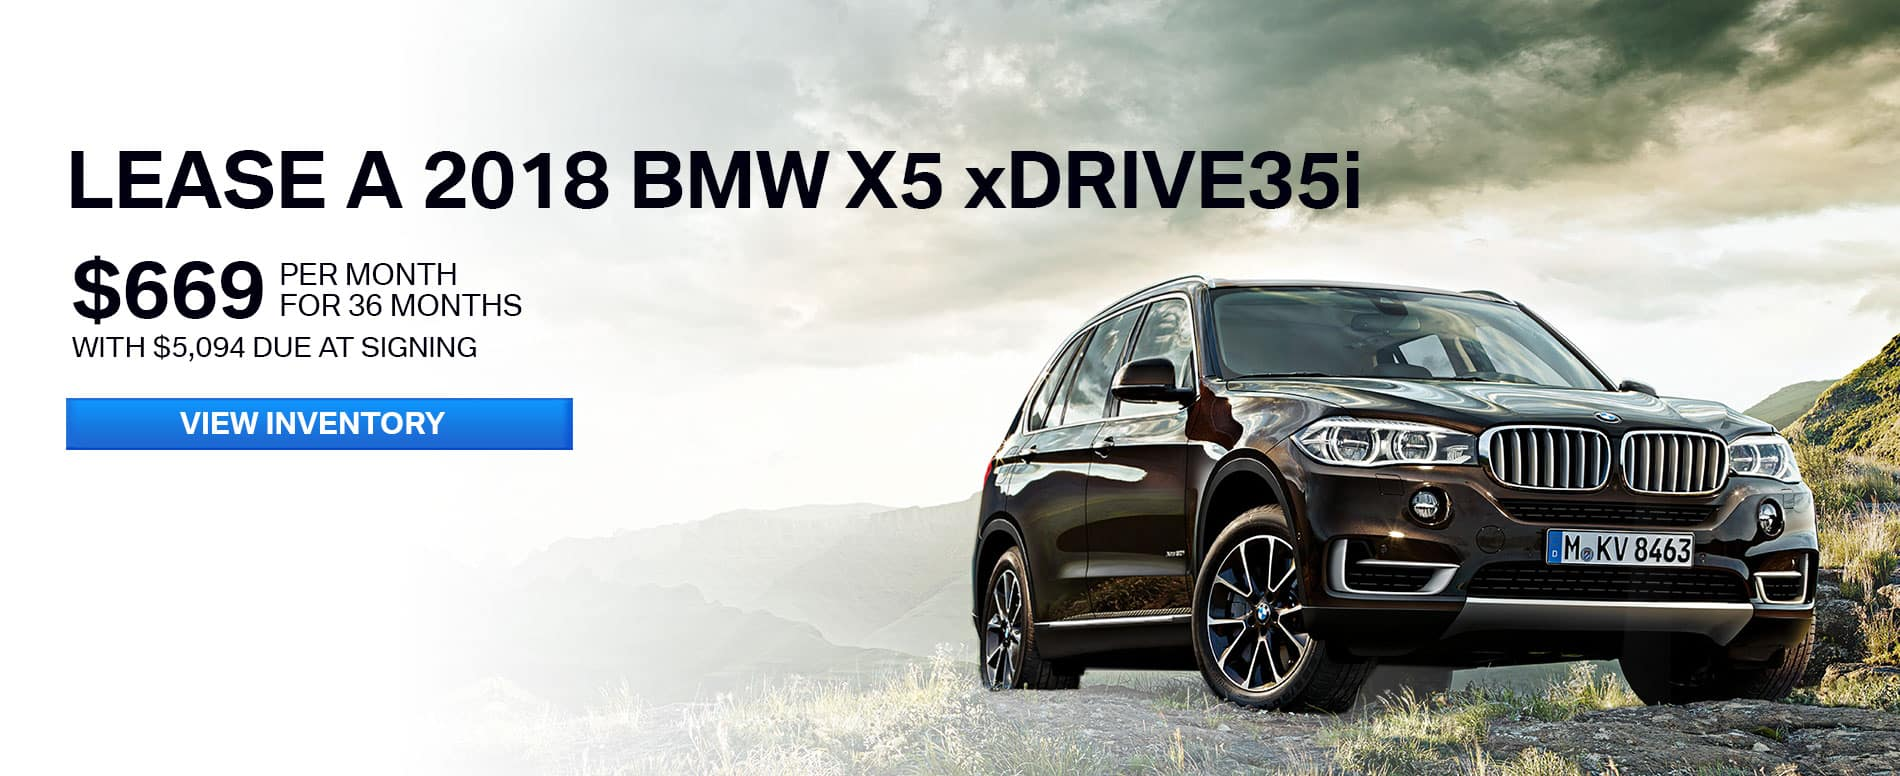 BMW Lease Offer June 2018